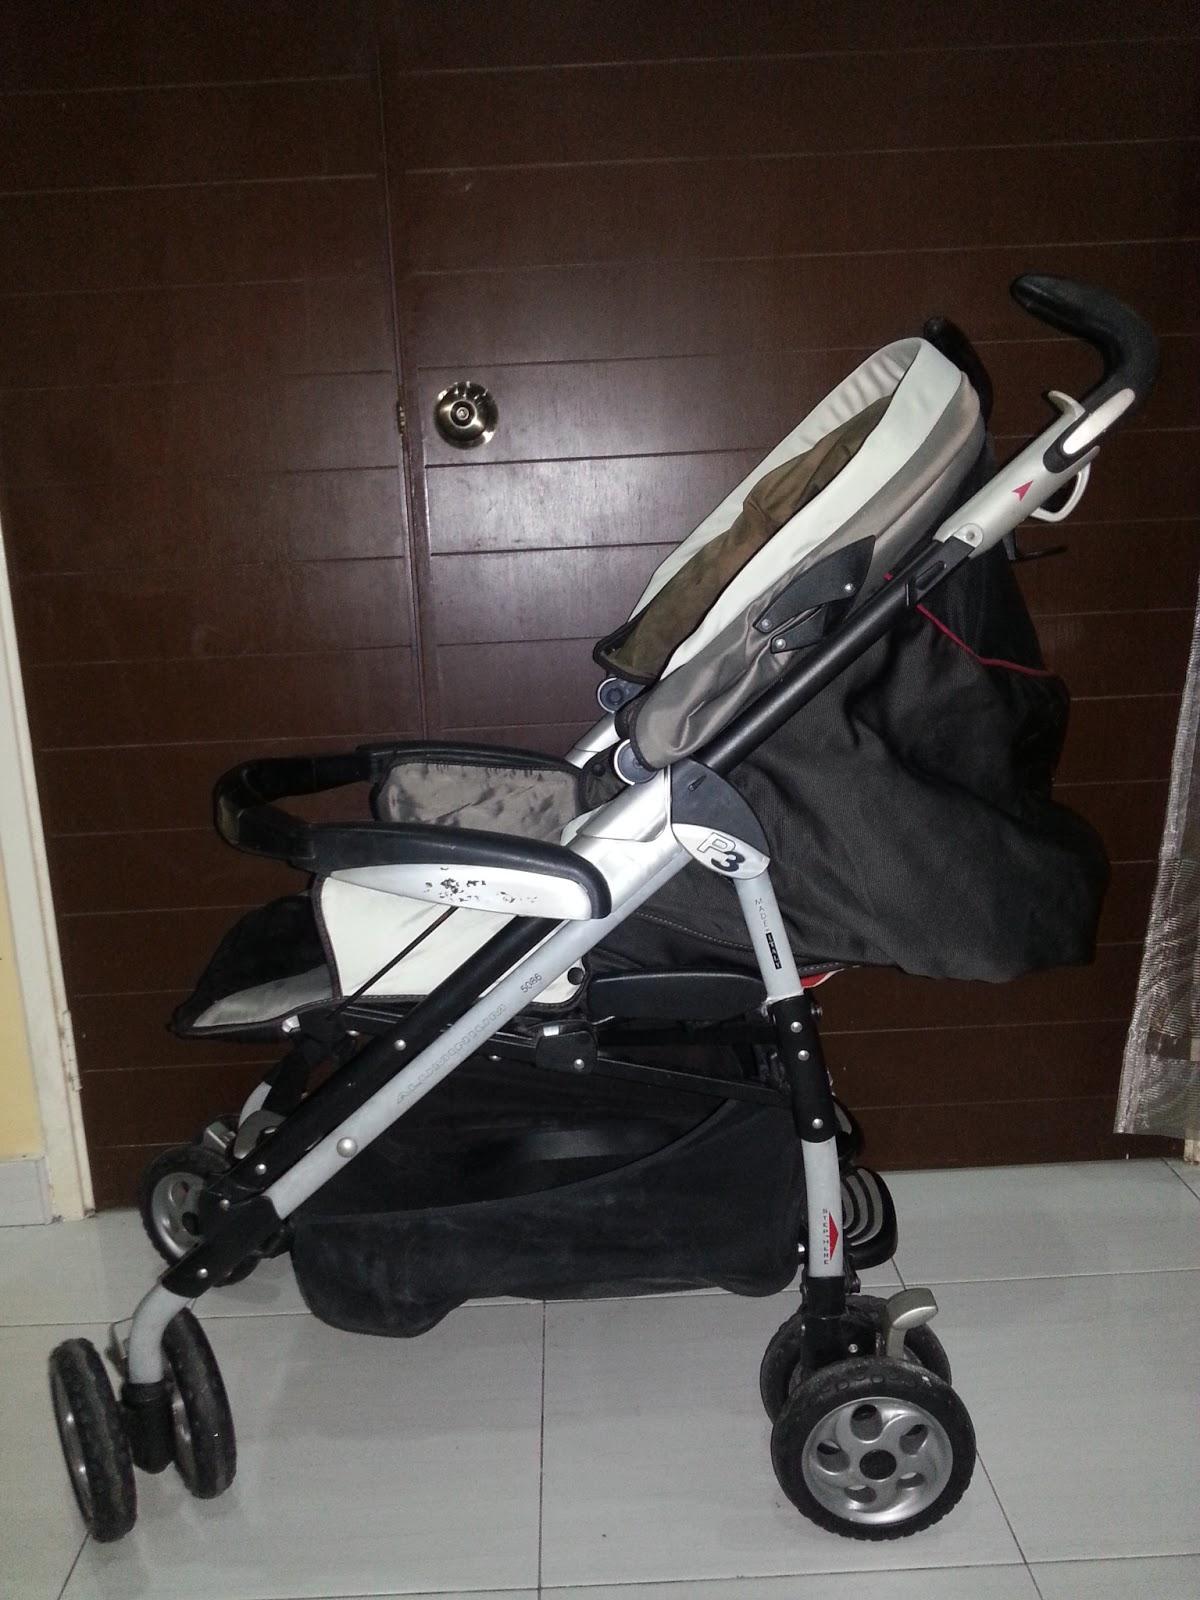 clearance sale peg perego pliko p3 compact classico stroller. Black Bedroom Furniture Sets. Home Design Ideas